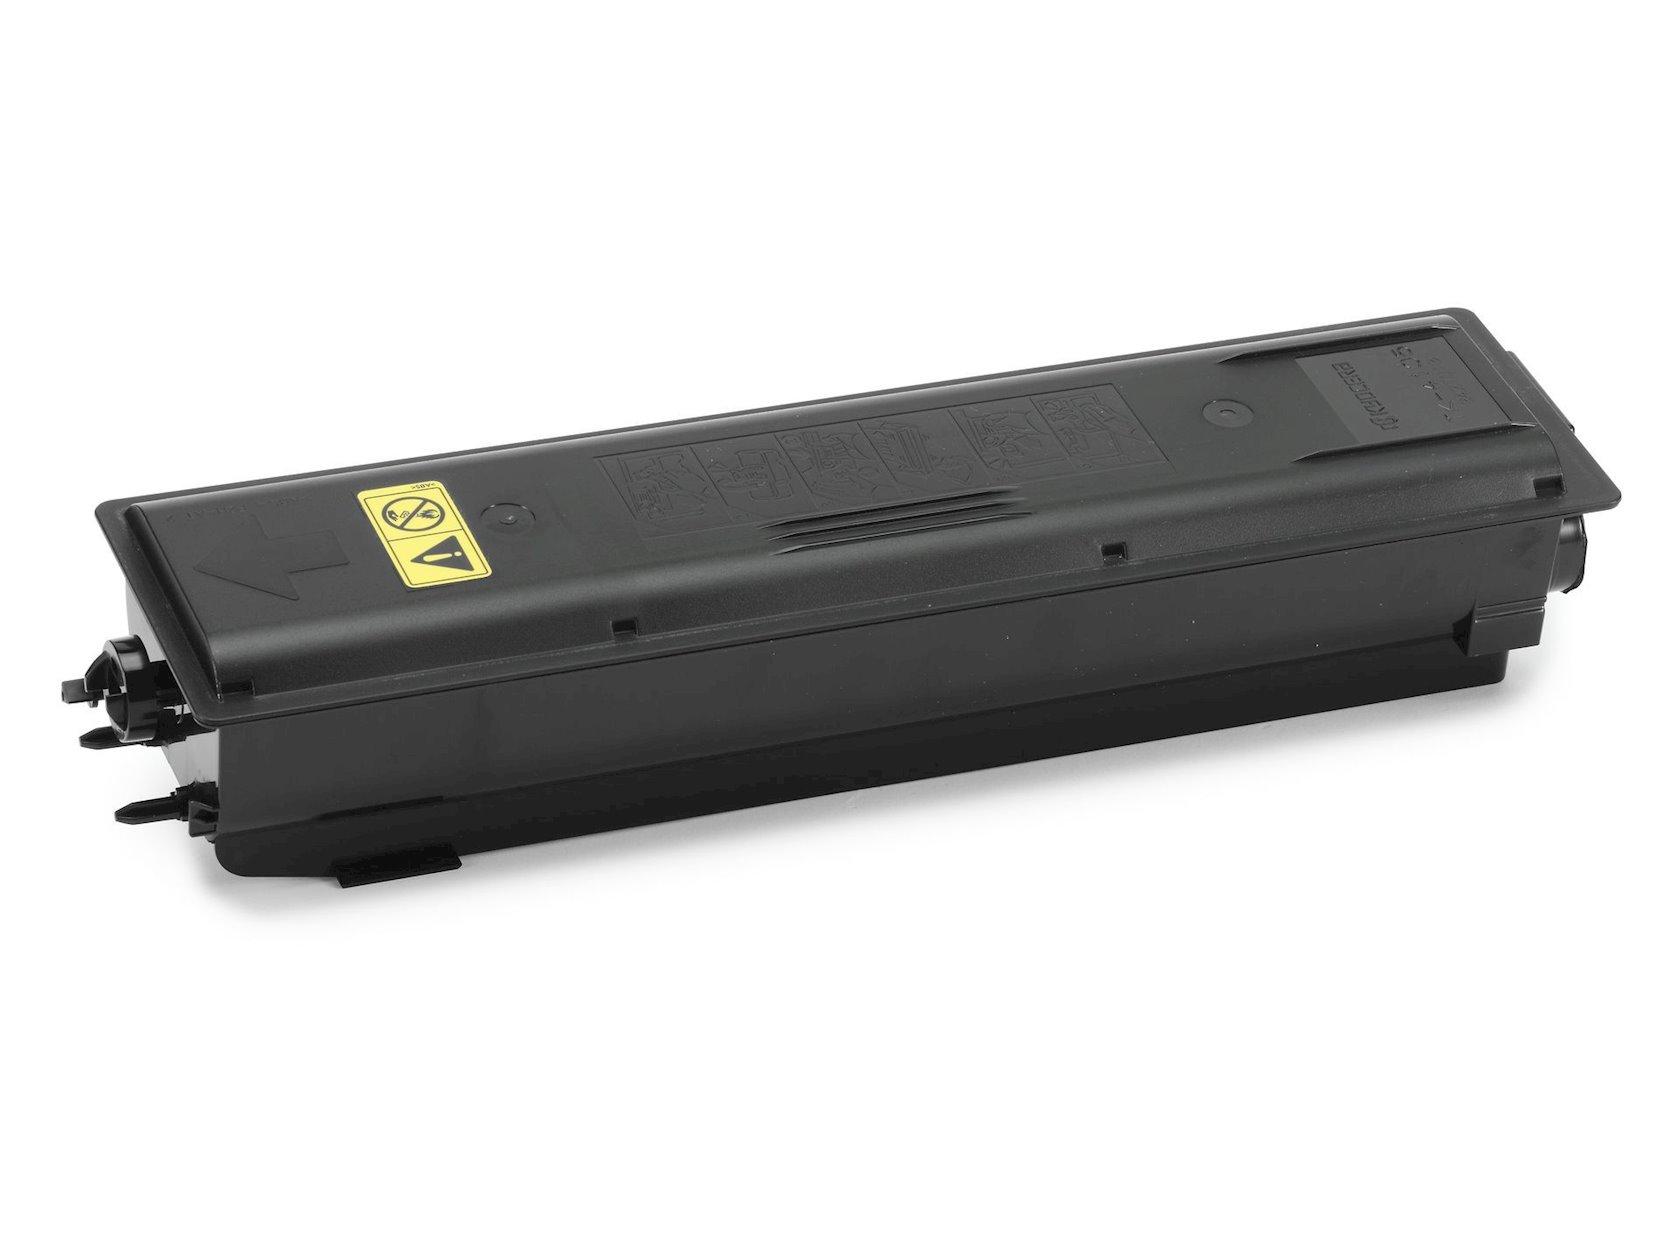 Toner-kartric Kyocera TK-4105 Black